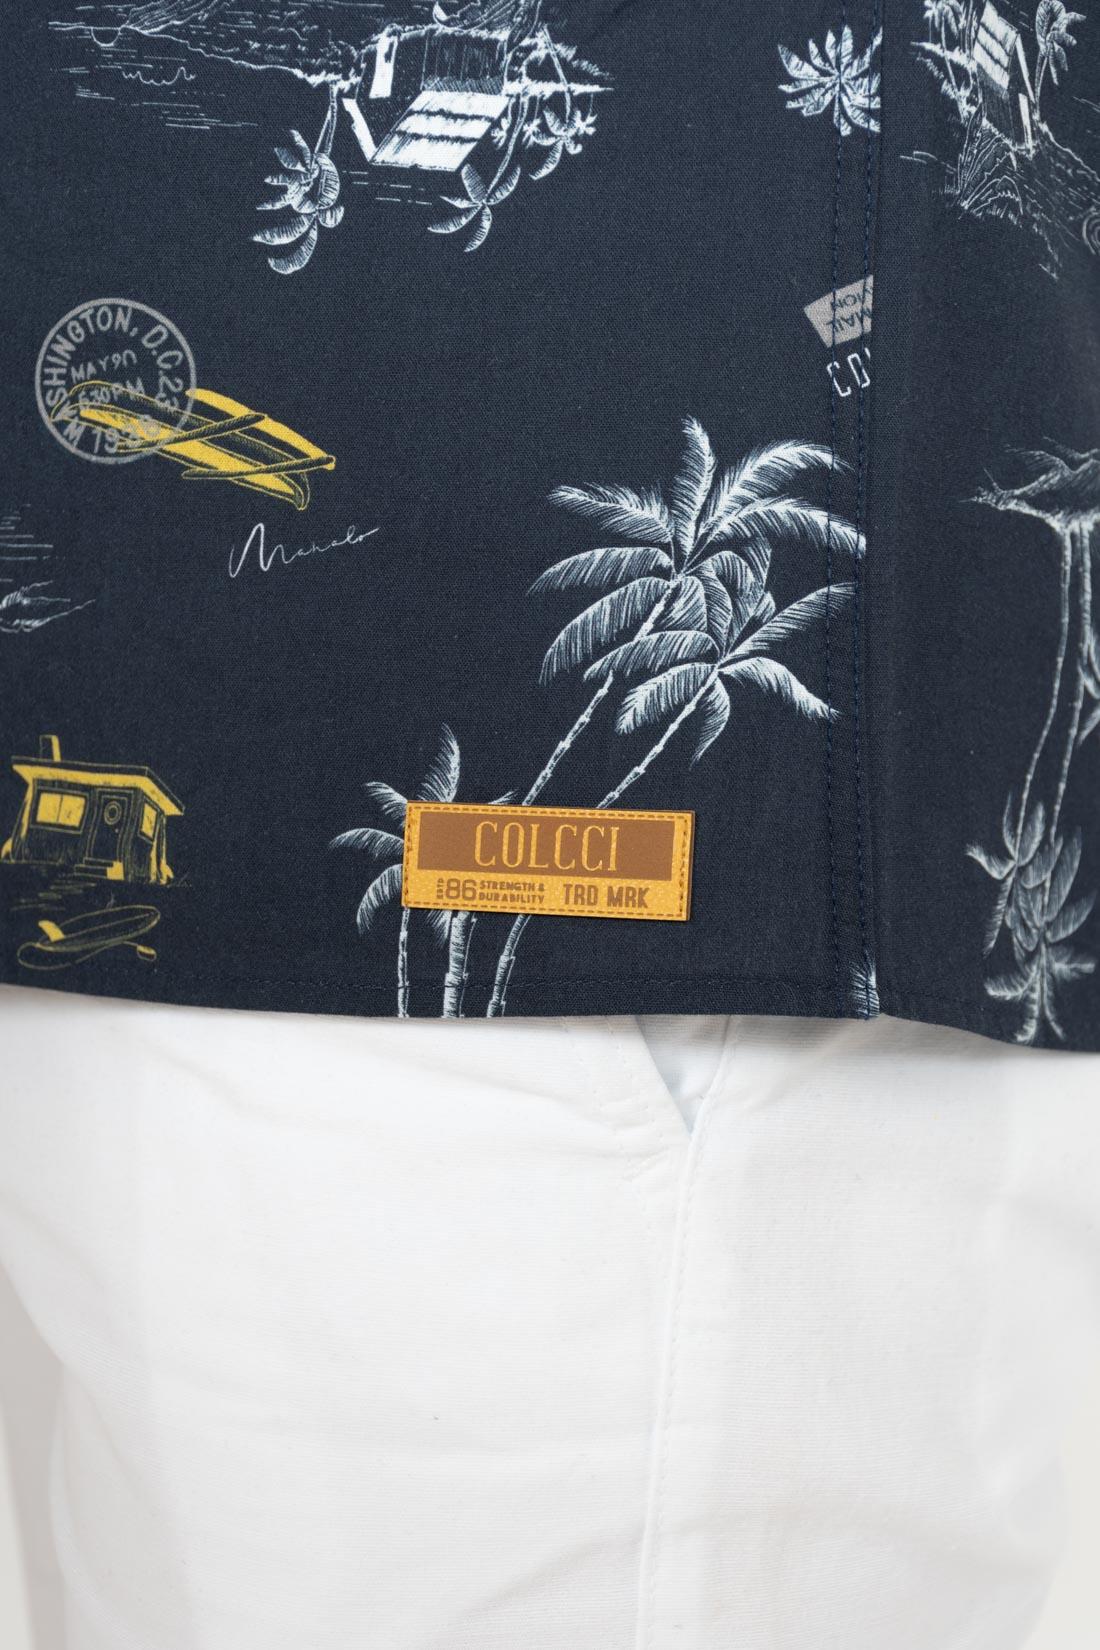 Camisa Mc Colcci Porto Belo